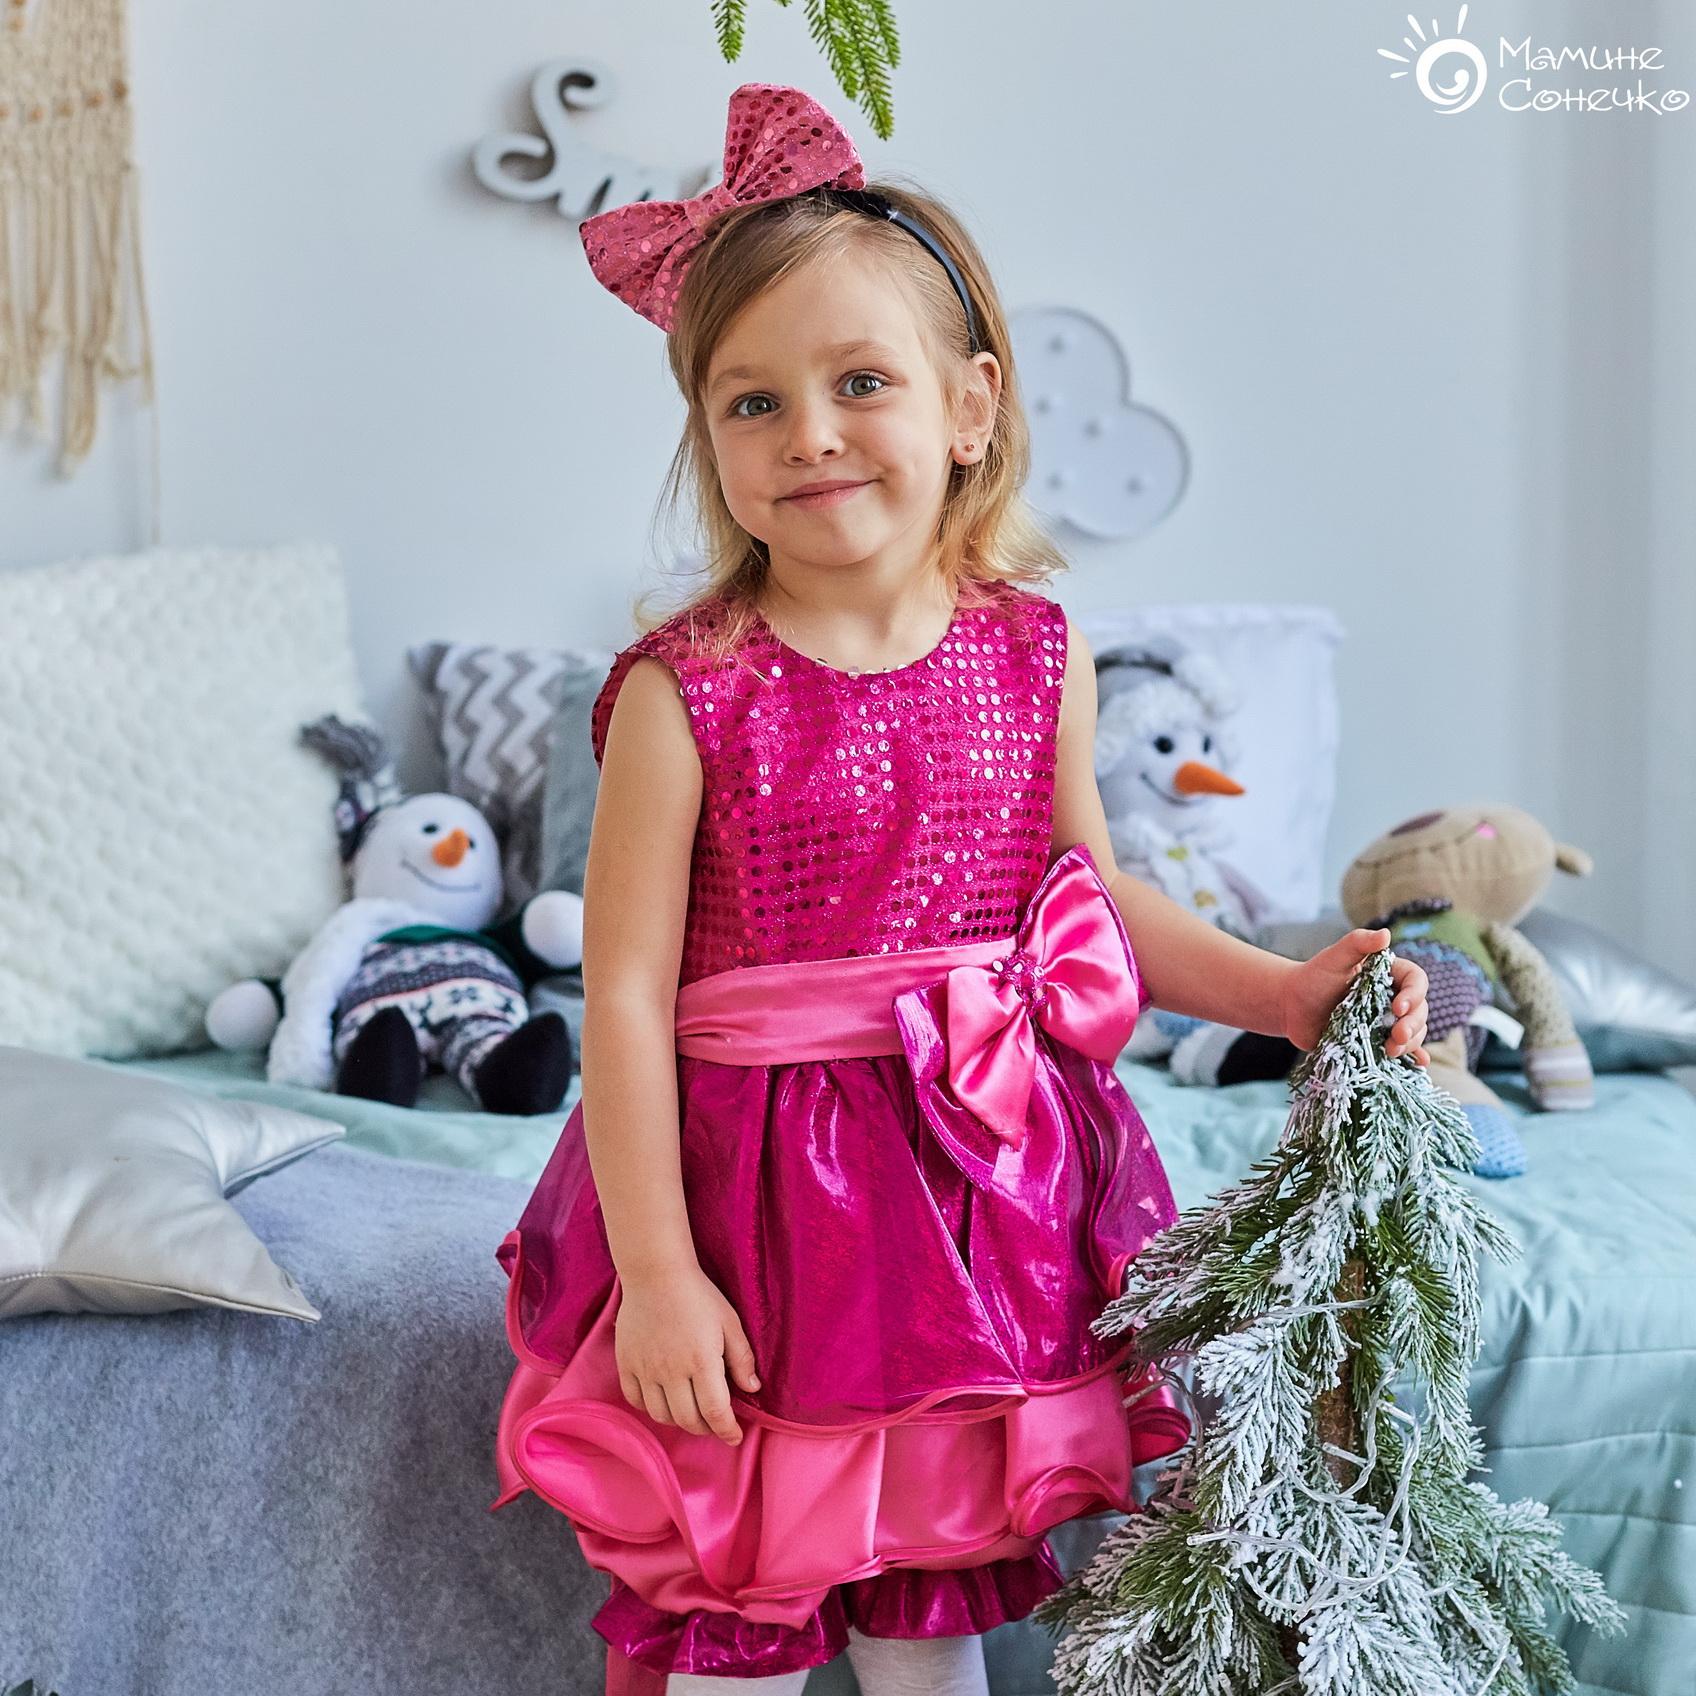 kostium-tsukerochka-malynova-4